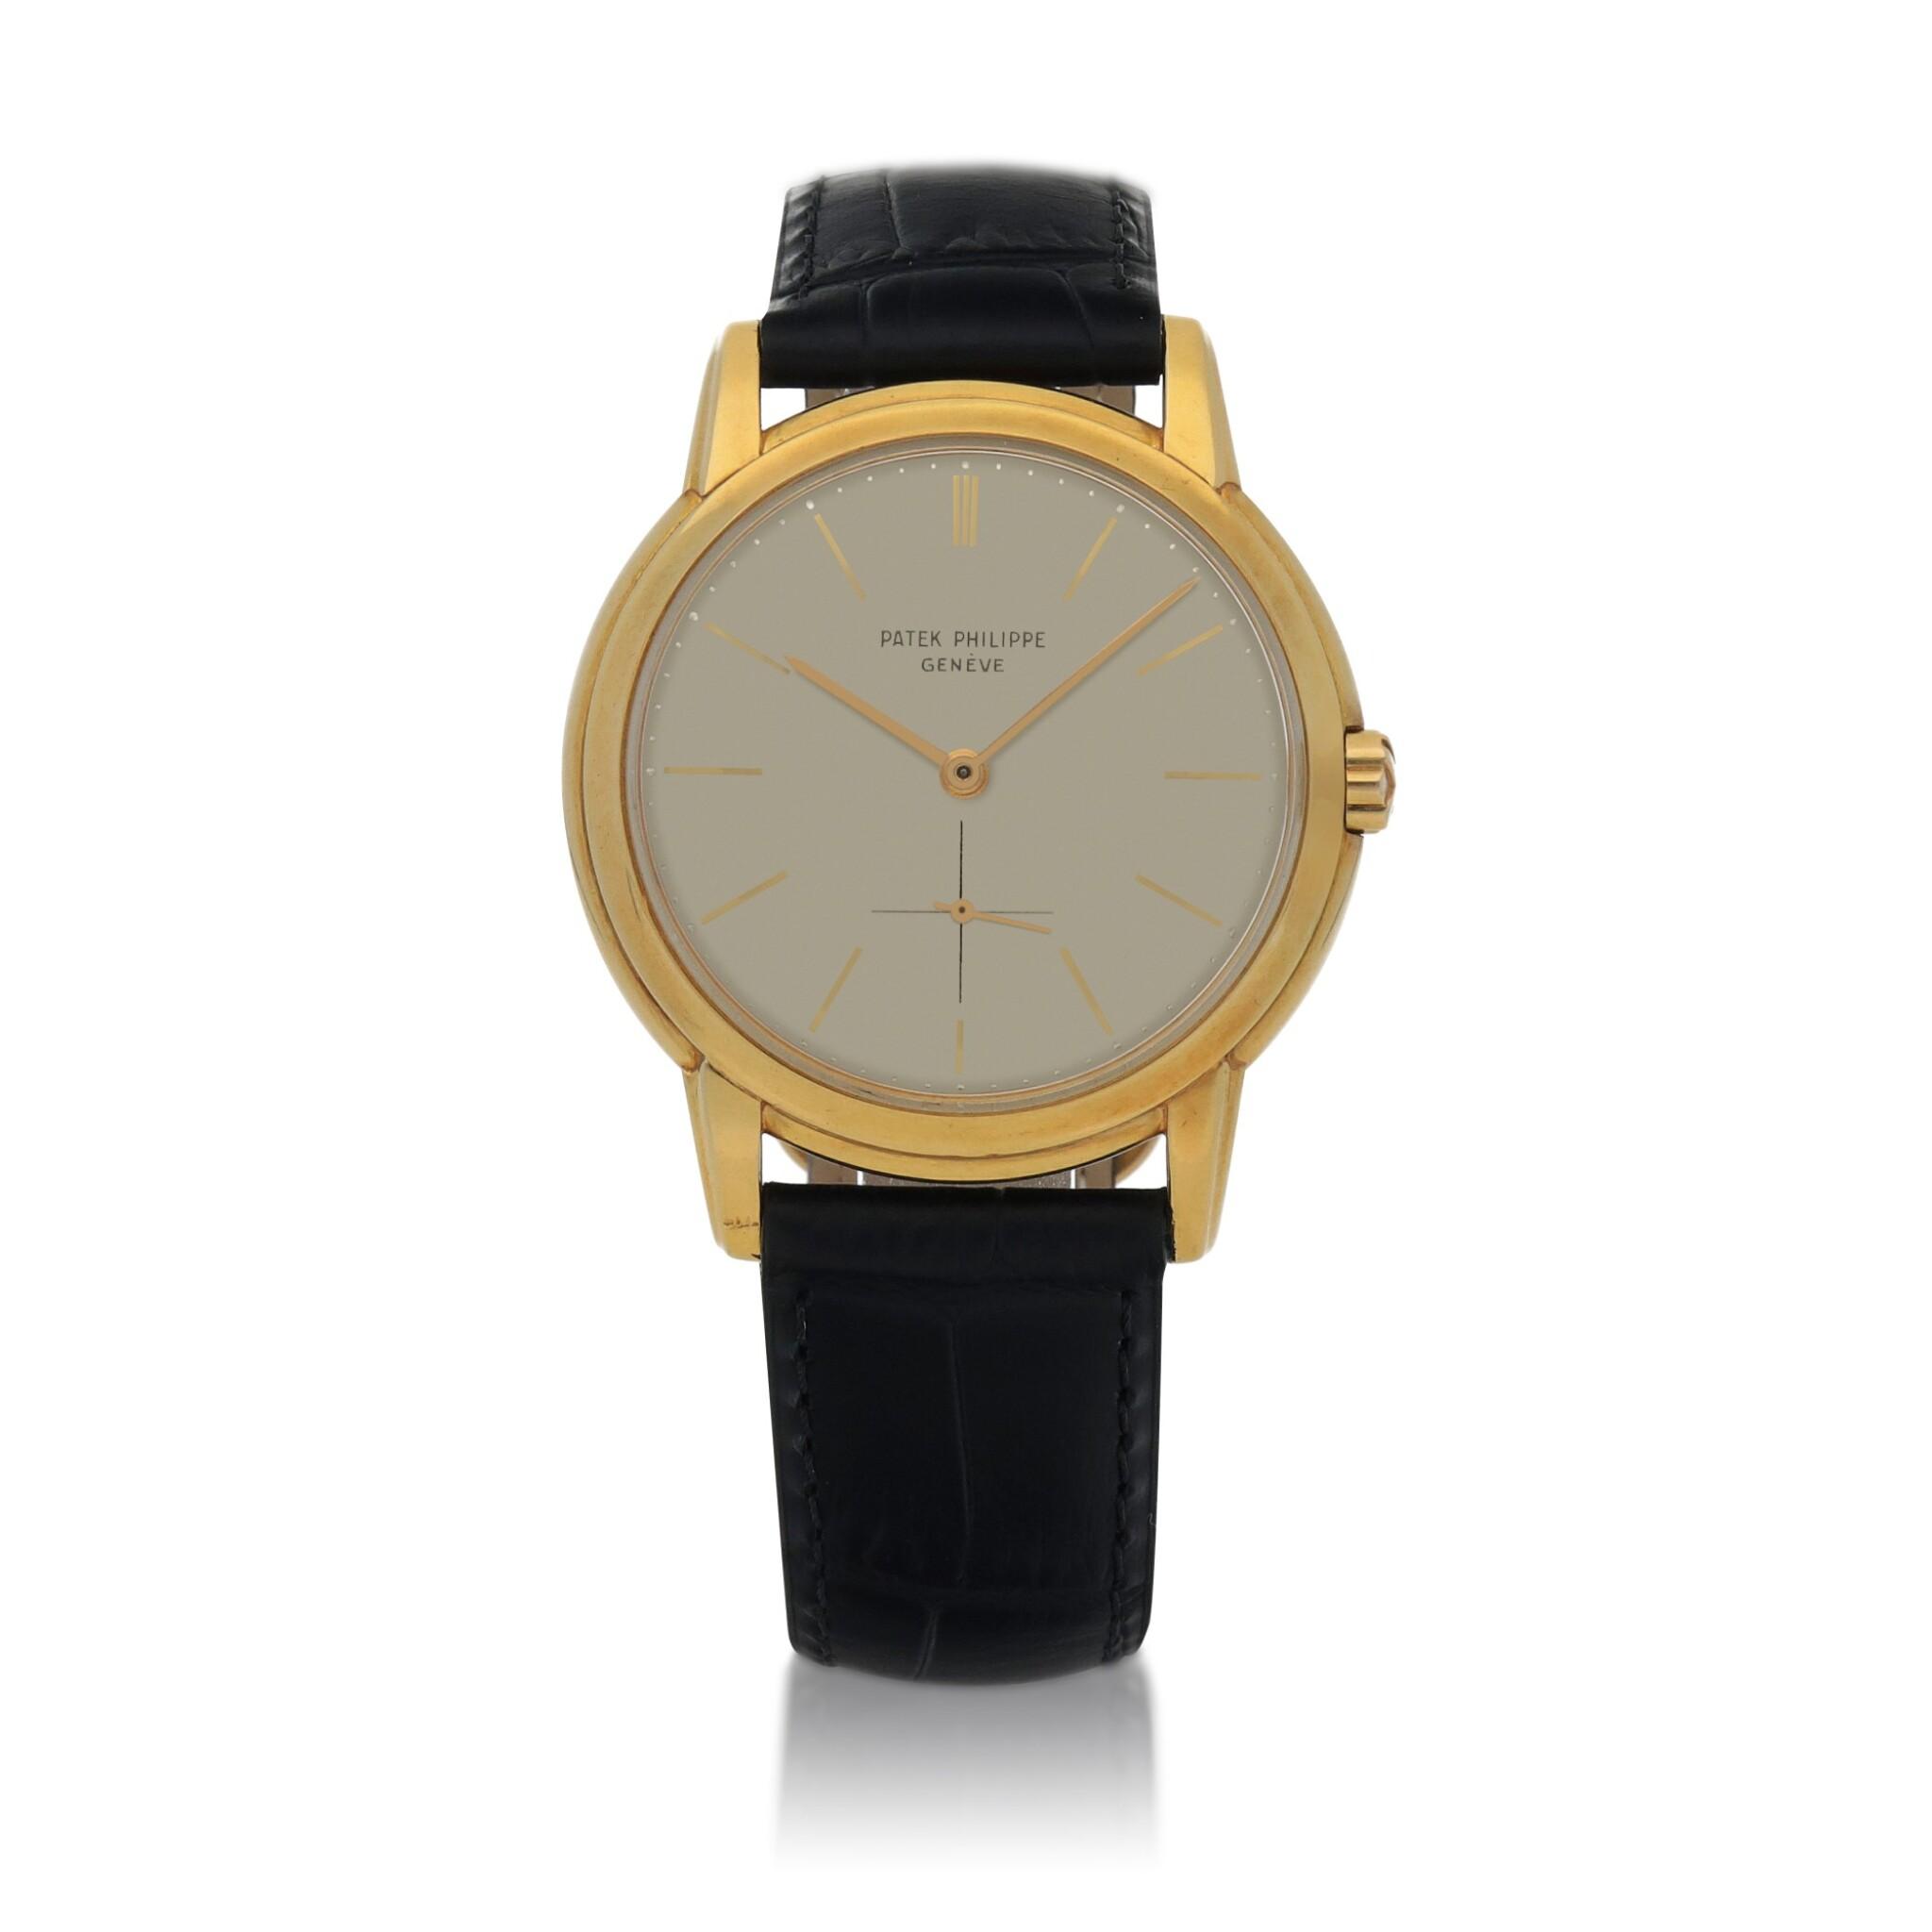 View full screen - View 1 of Lot 81. Ref. 2551 Yellow gold wristwatch Made in 1958 | 百達翡麗 2551型號黃金腕錶,1958年製.